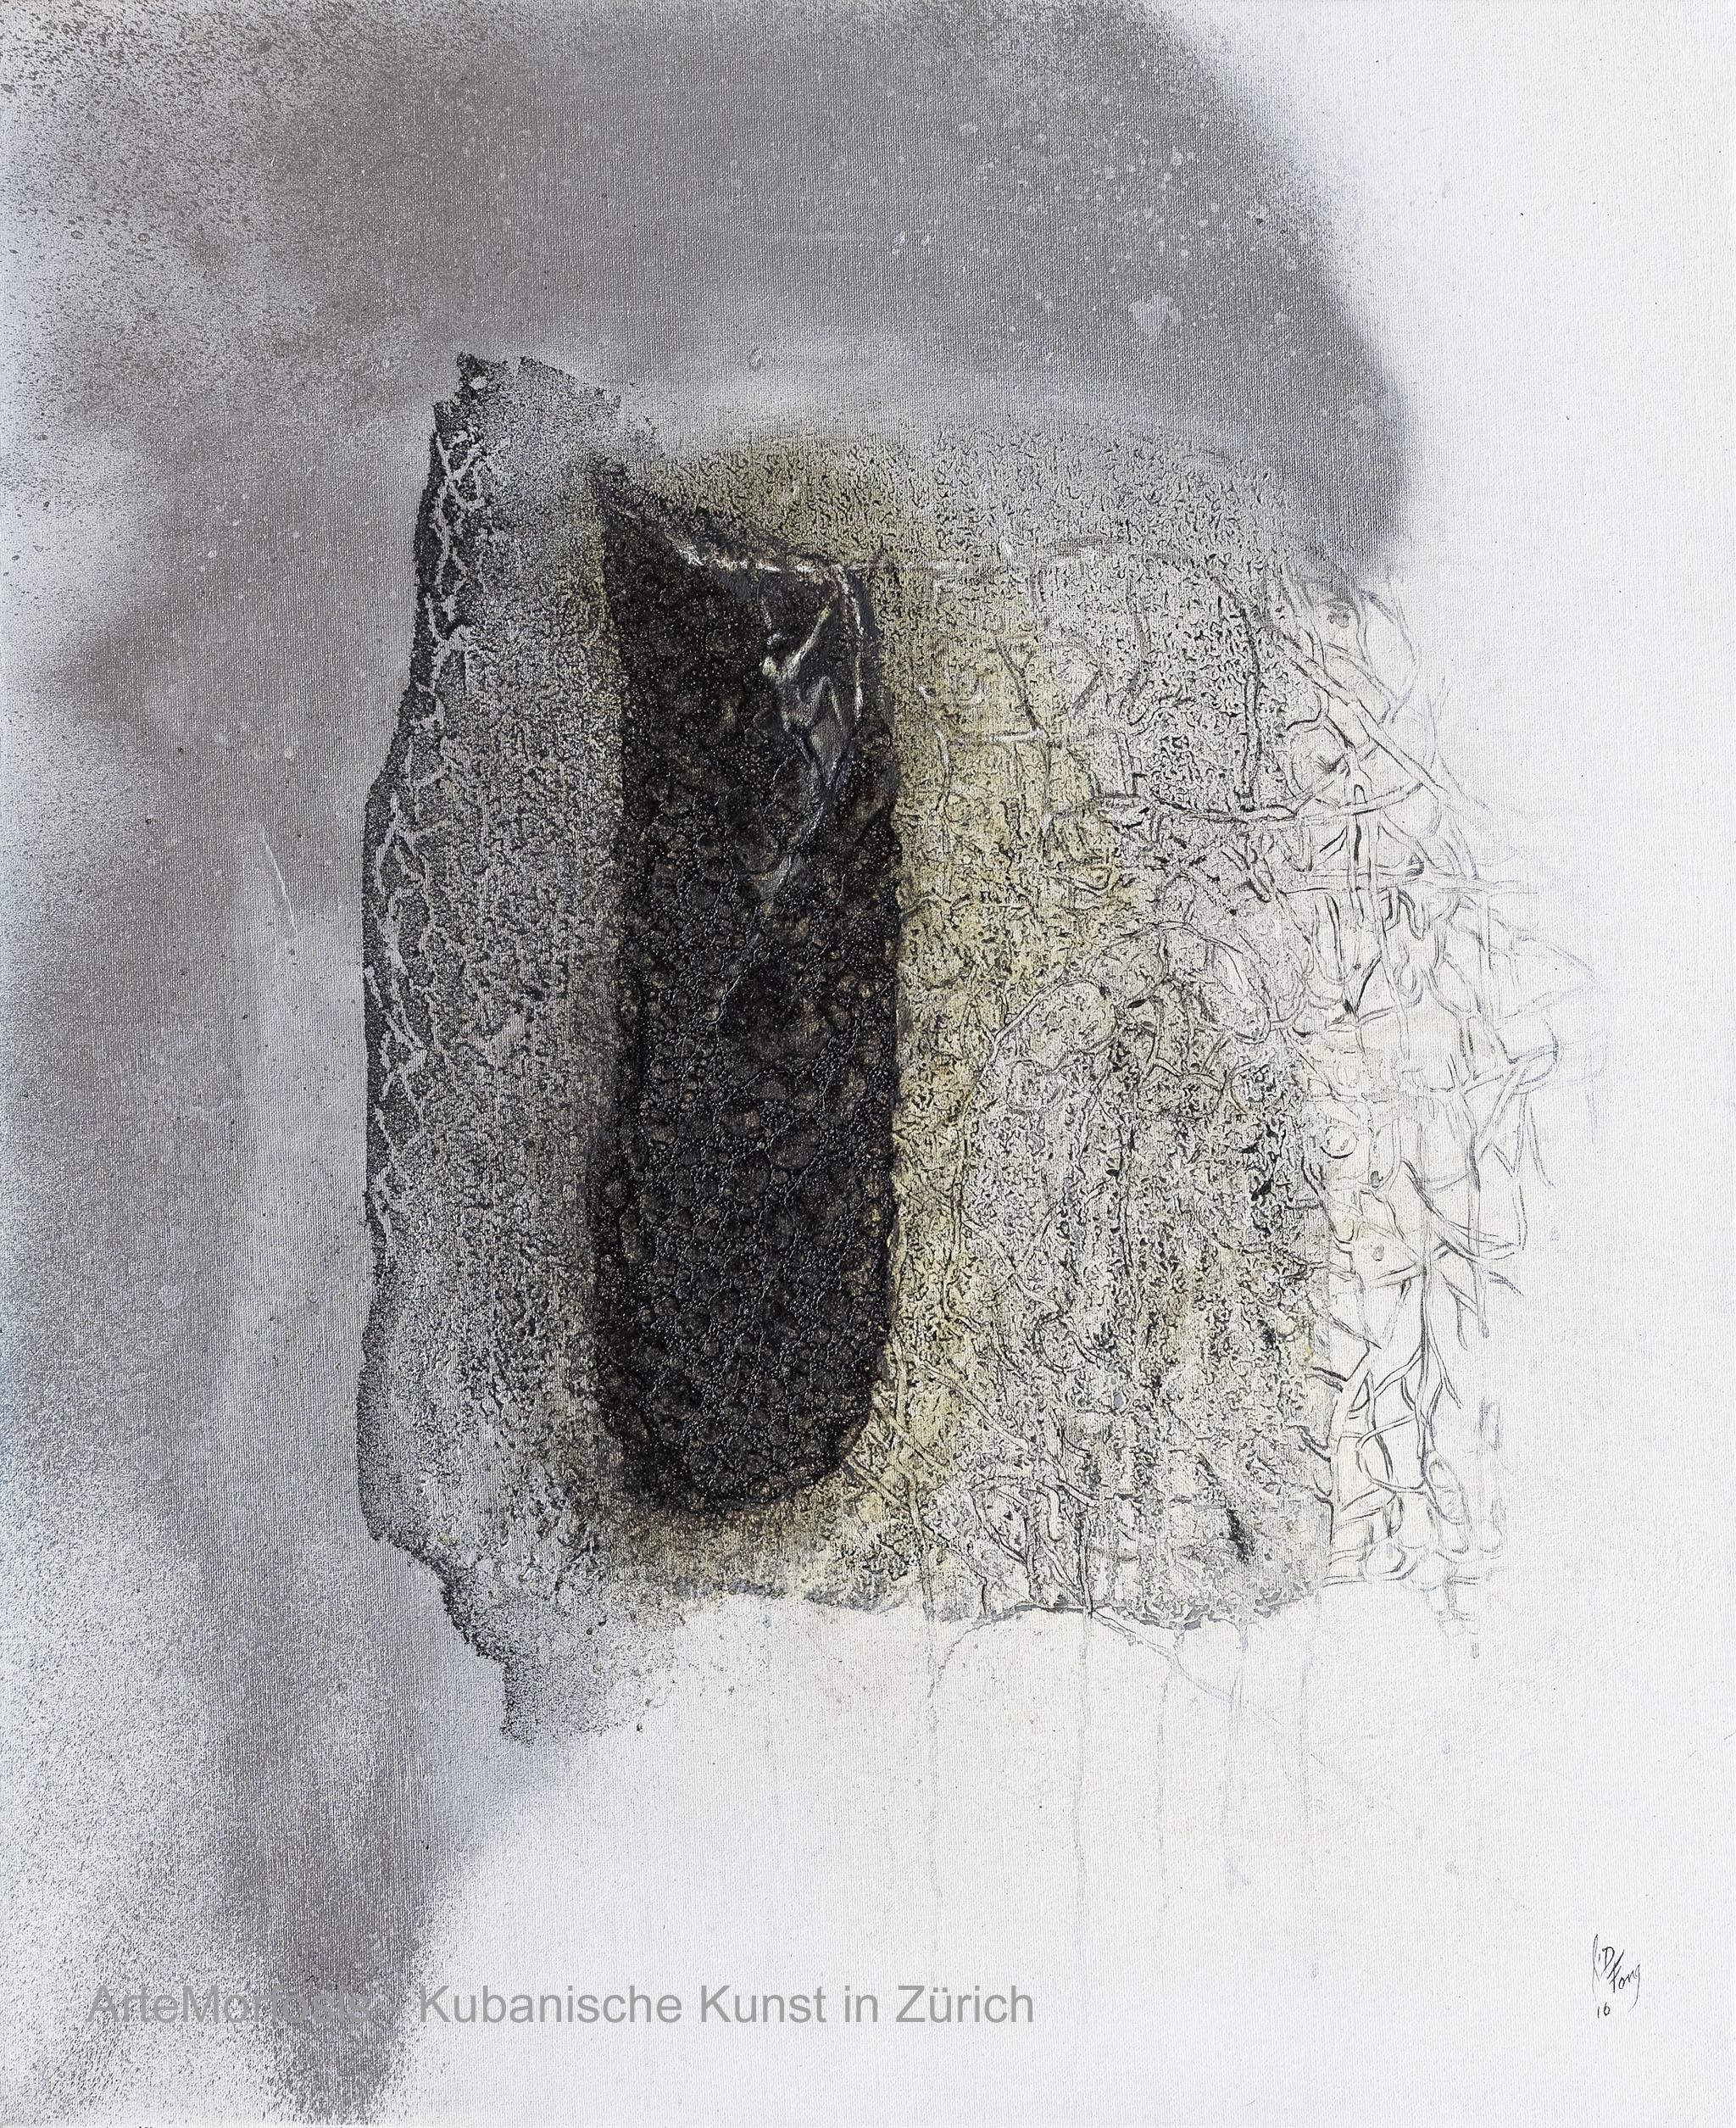 Li D Fong: Sobreviviente / Survivor Mixed on Canvas, 2016 80 x 65 cm